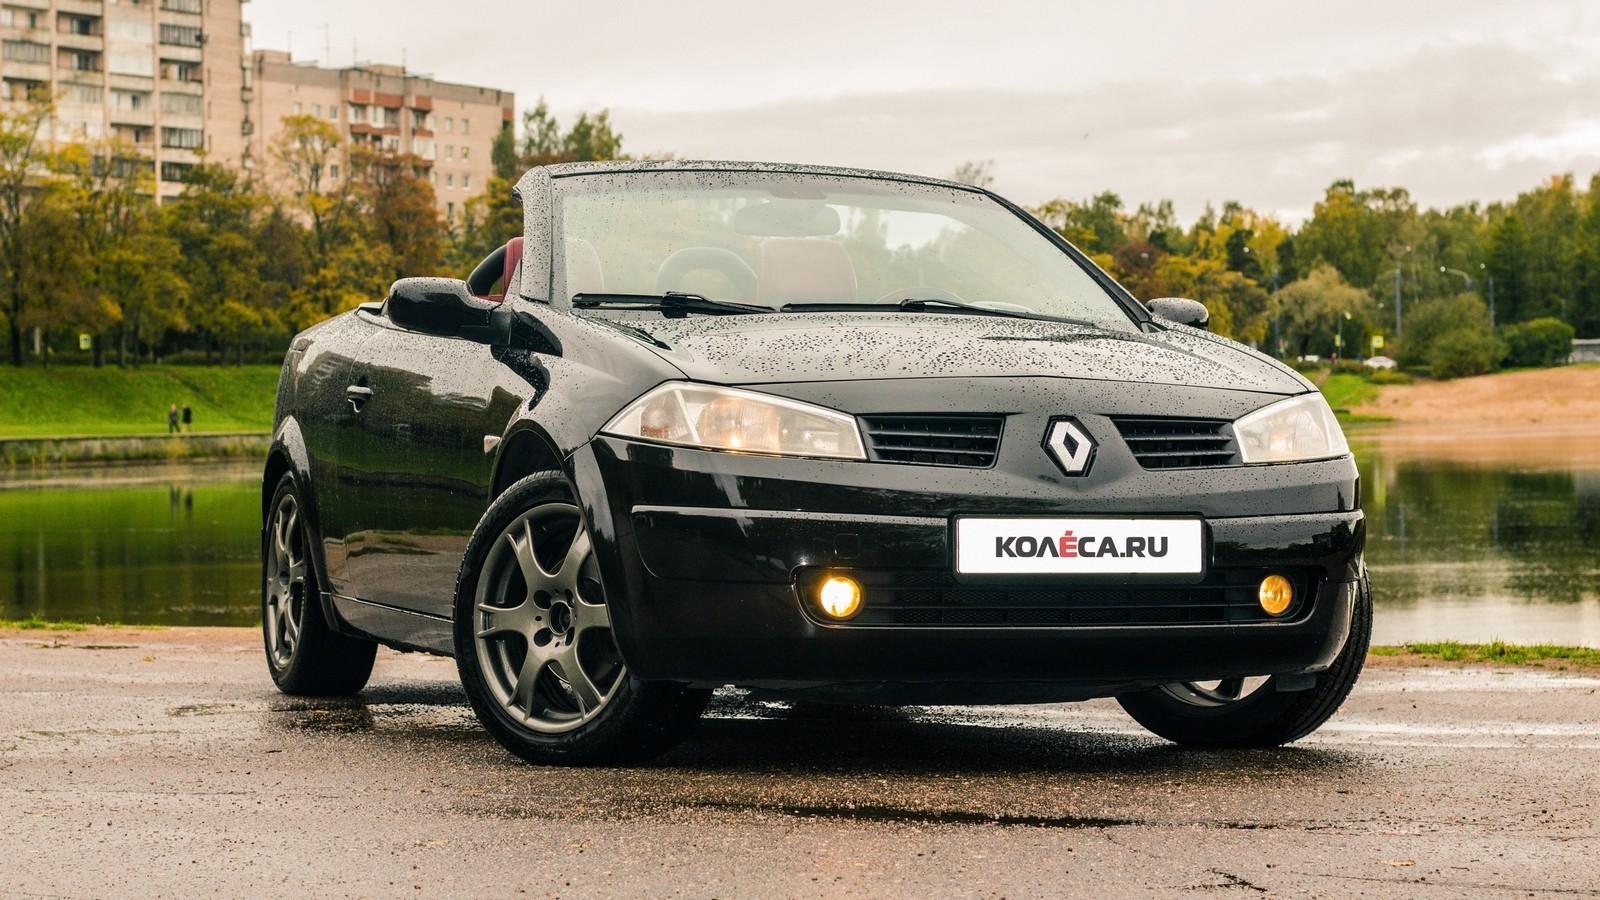 Renault-Megane-кабриолет-три-четверти-(4)